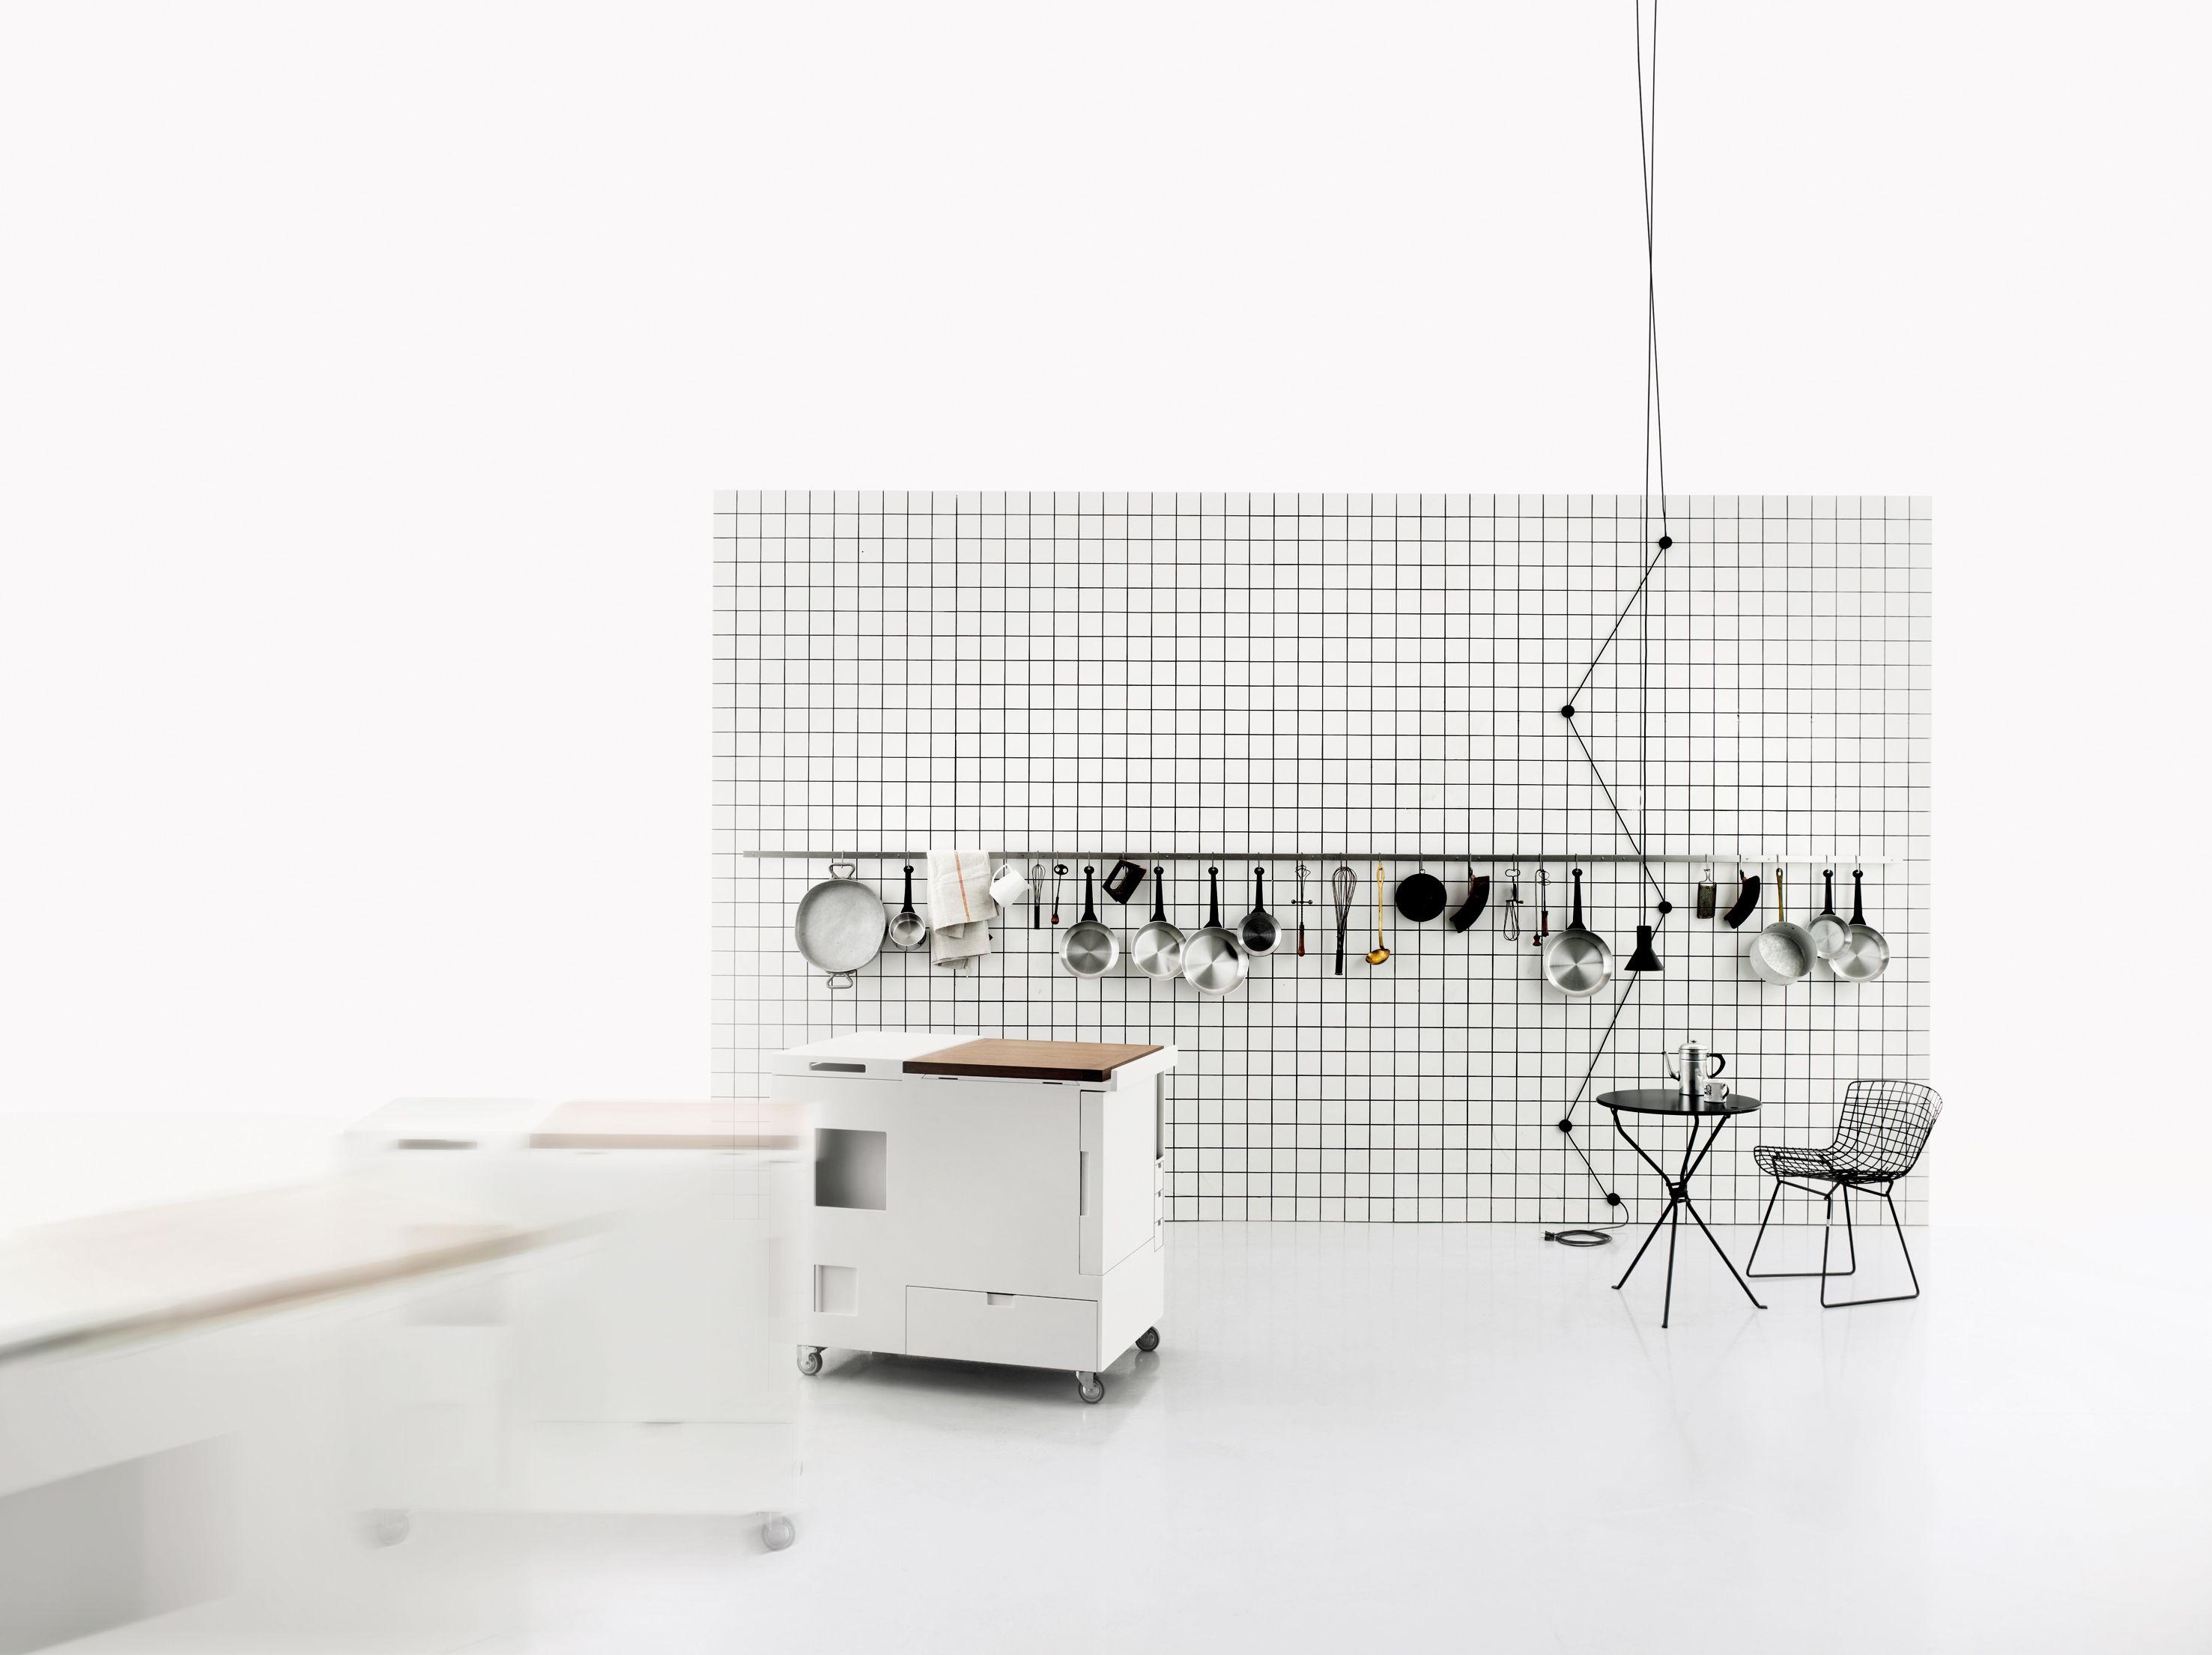 Mini-Küche aus Corian® MINIKITCHEN by Boffi   Food & Interior ...